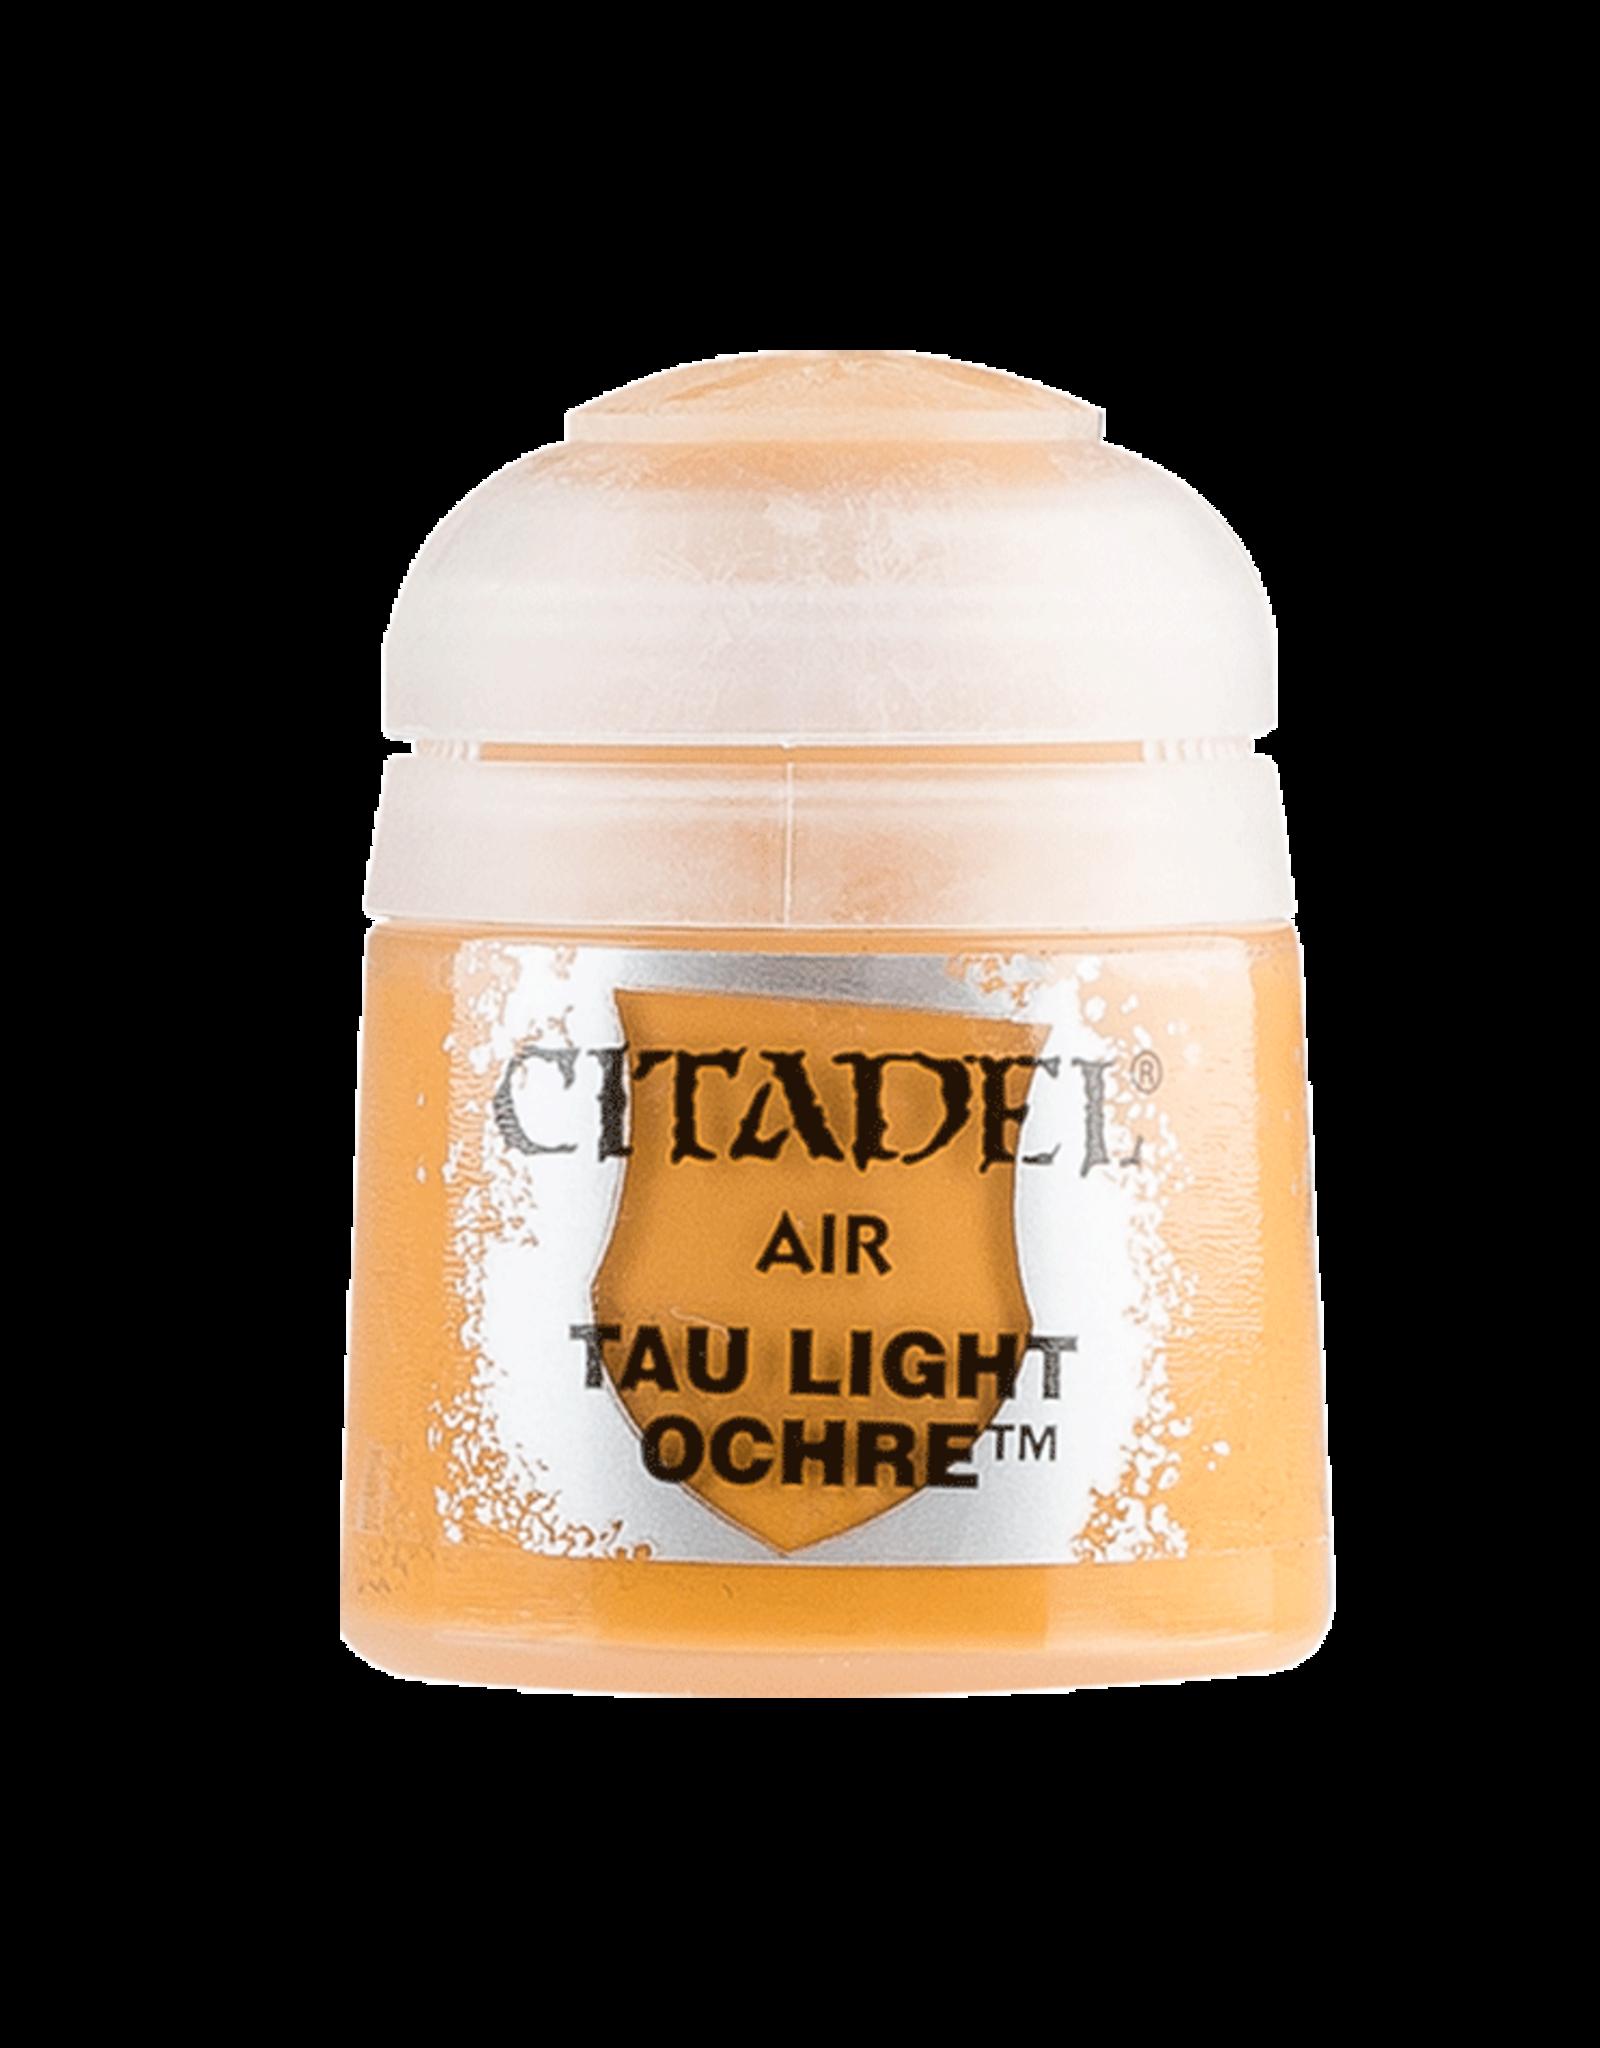 Games Workshop Citadel Air: Tau Light Ochre (24ml)